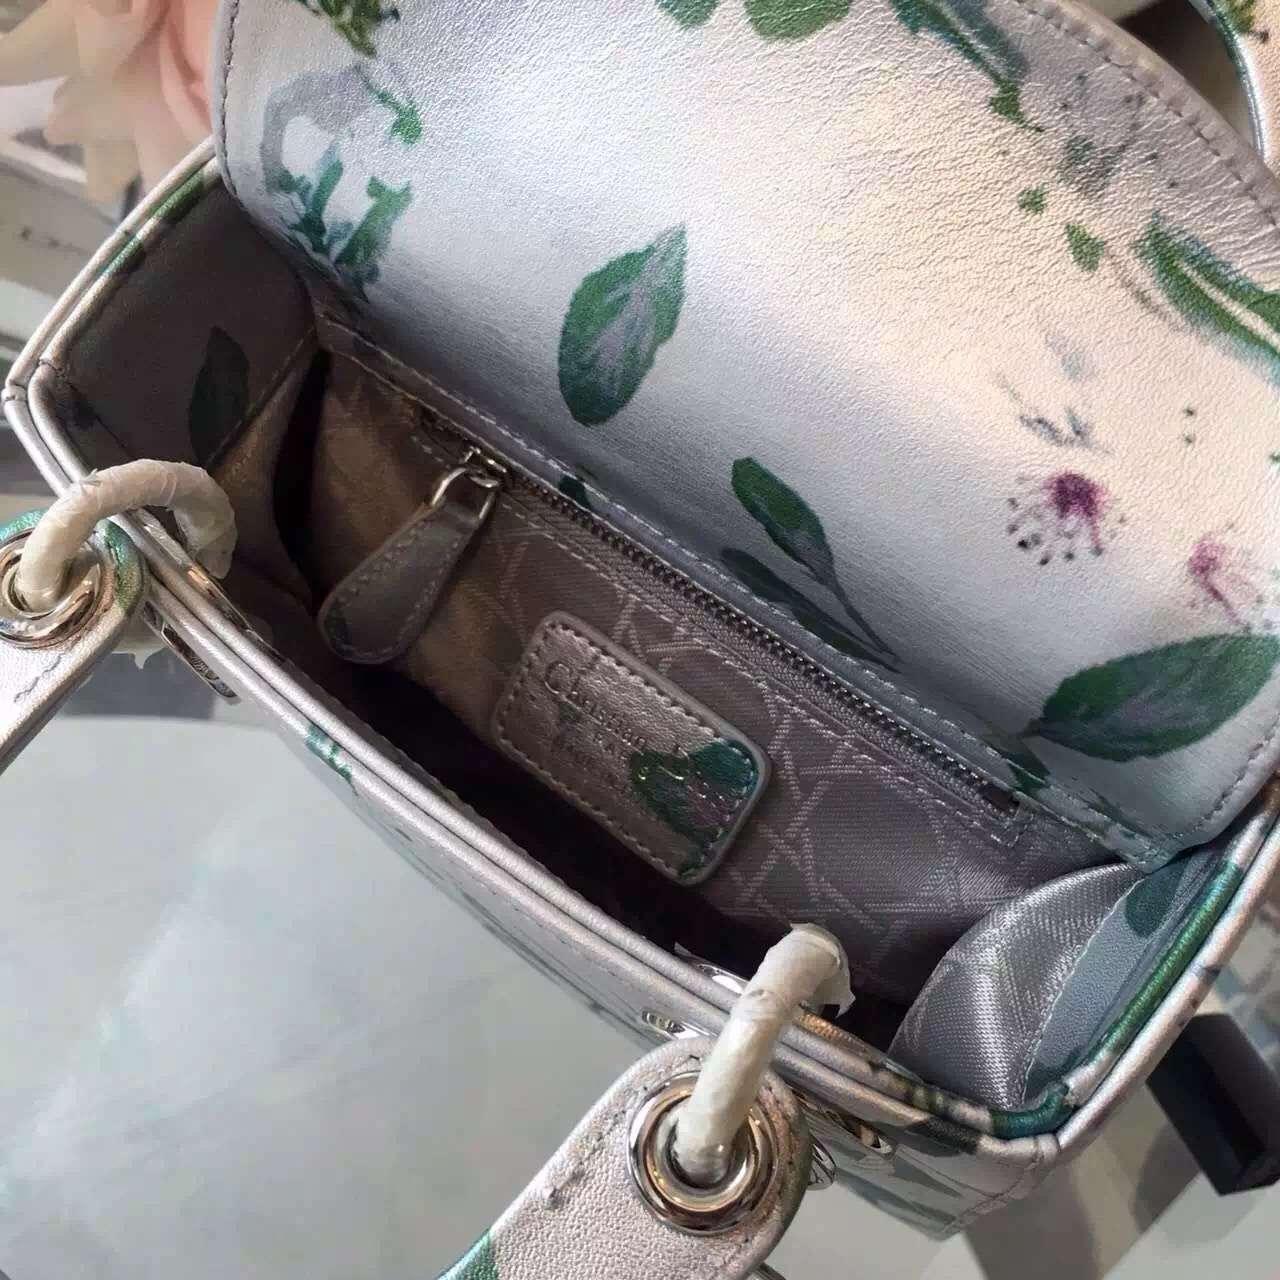 Lady Dior mini迷你戴妃包梨花印花款 迪奥链条单肩斜挎女包